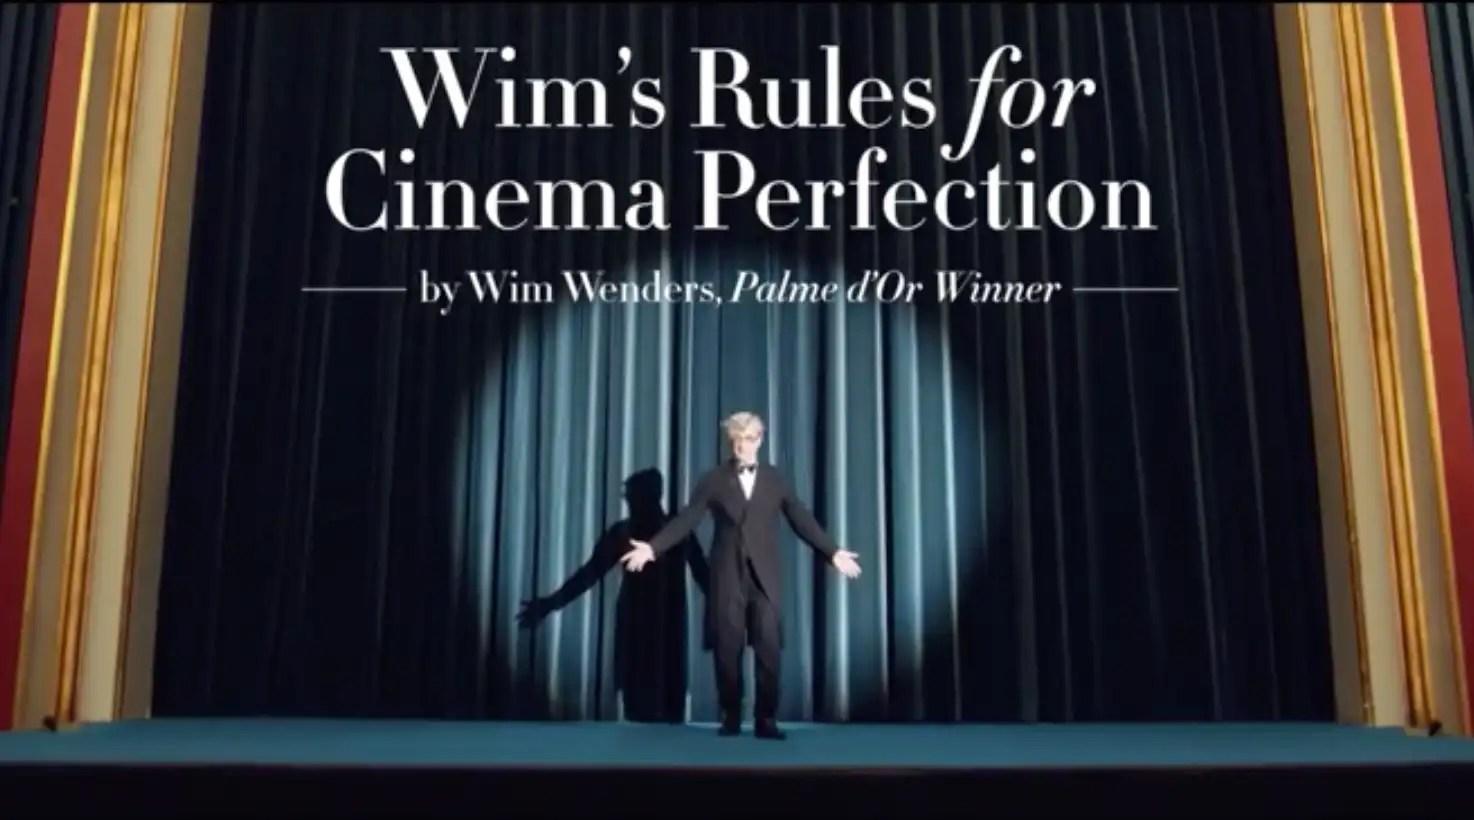 As regras do cinema segundo Wim Wenders – Take 2